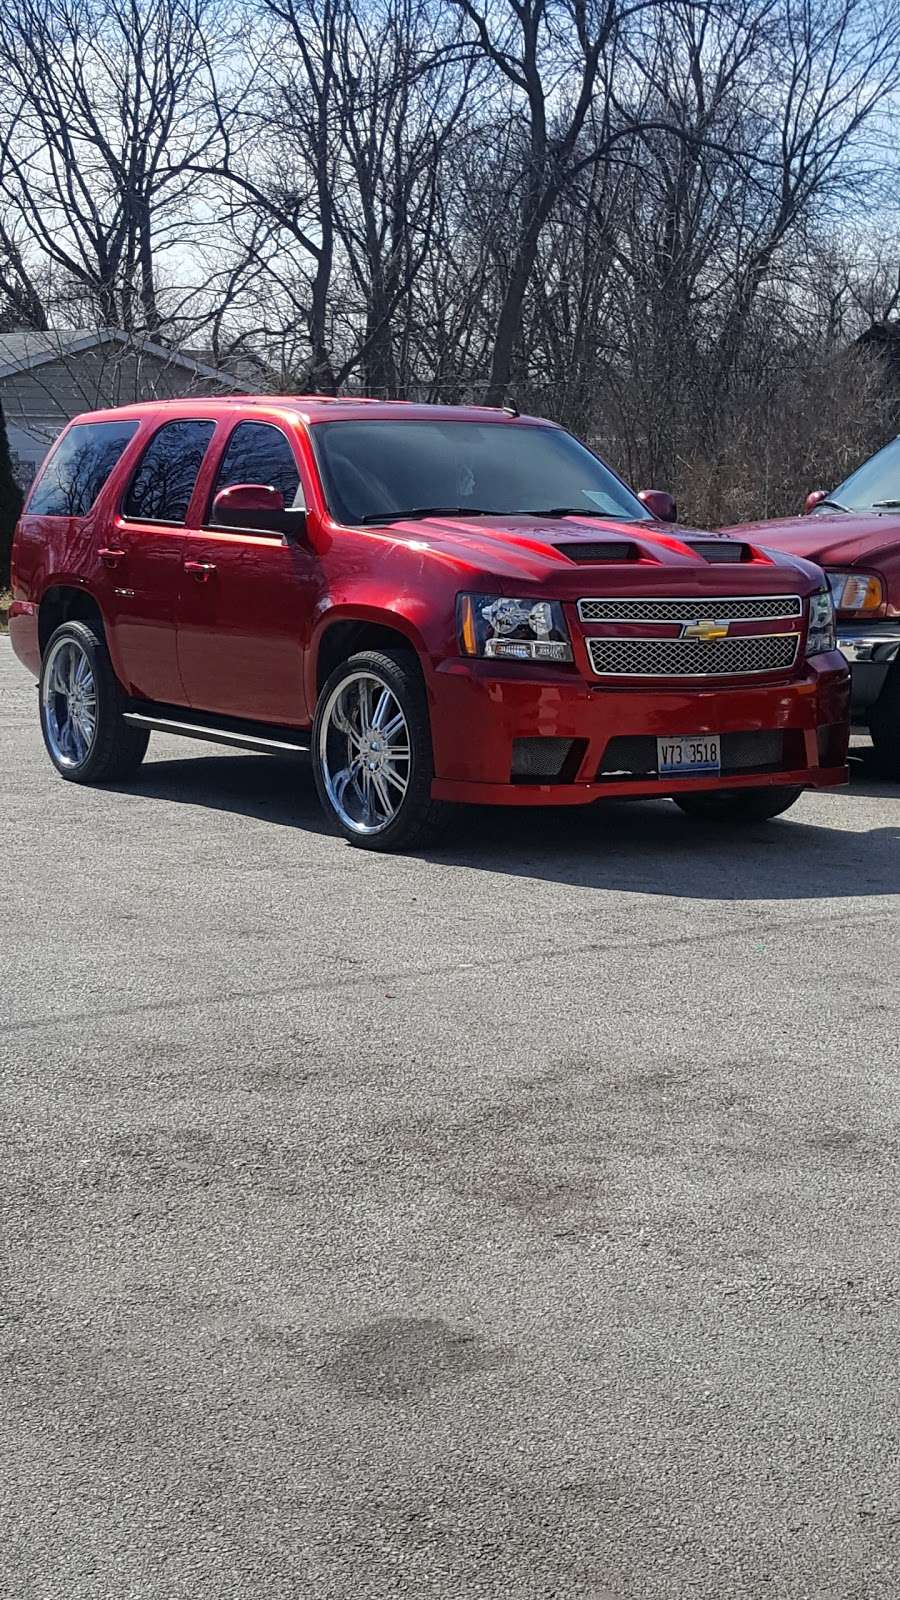 Power Motors Group Inc - car dealer  | Photo 10 of 10 | Address: 2829 Belvidere Rd, Waukegan, IL 60085, USA | Phone: (847) 625-6900